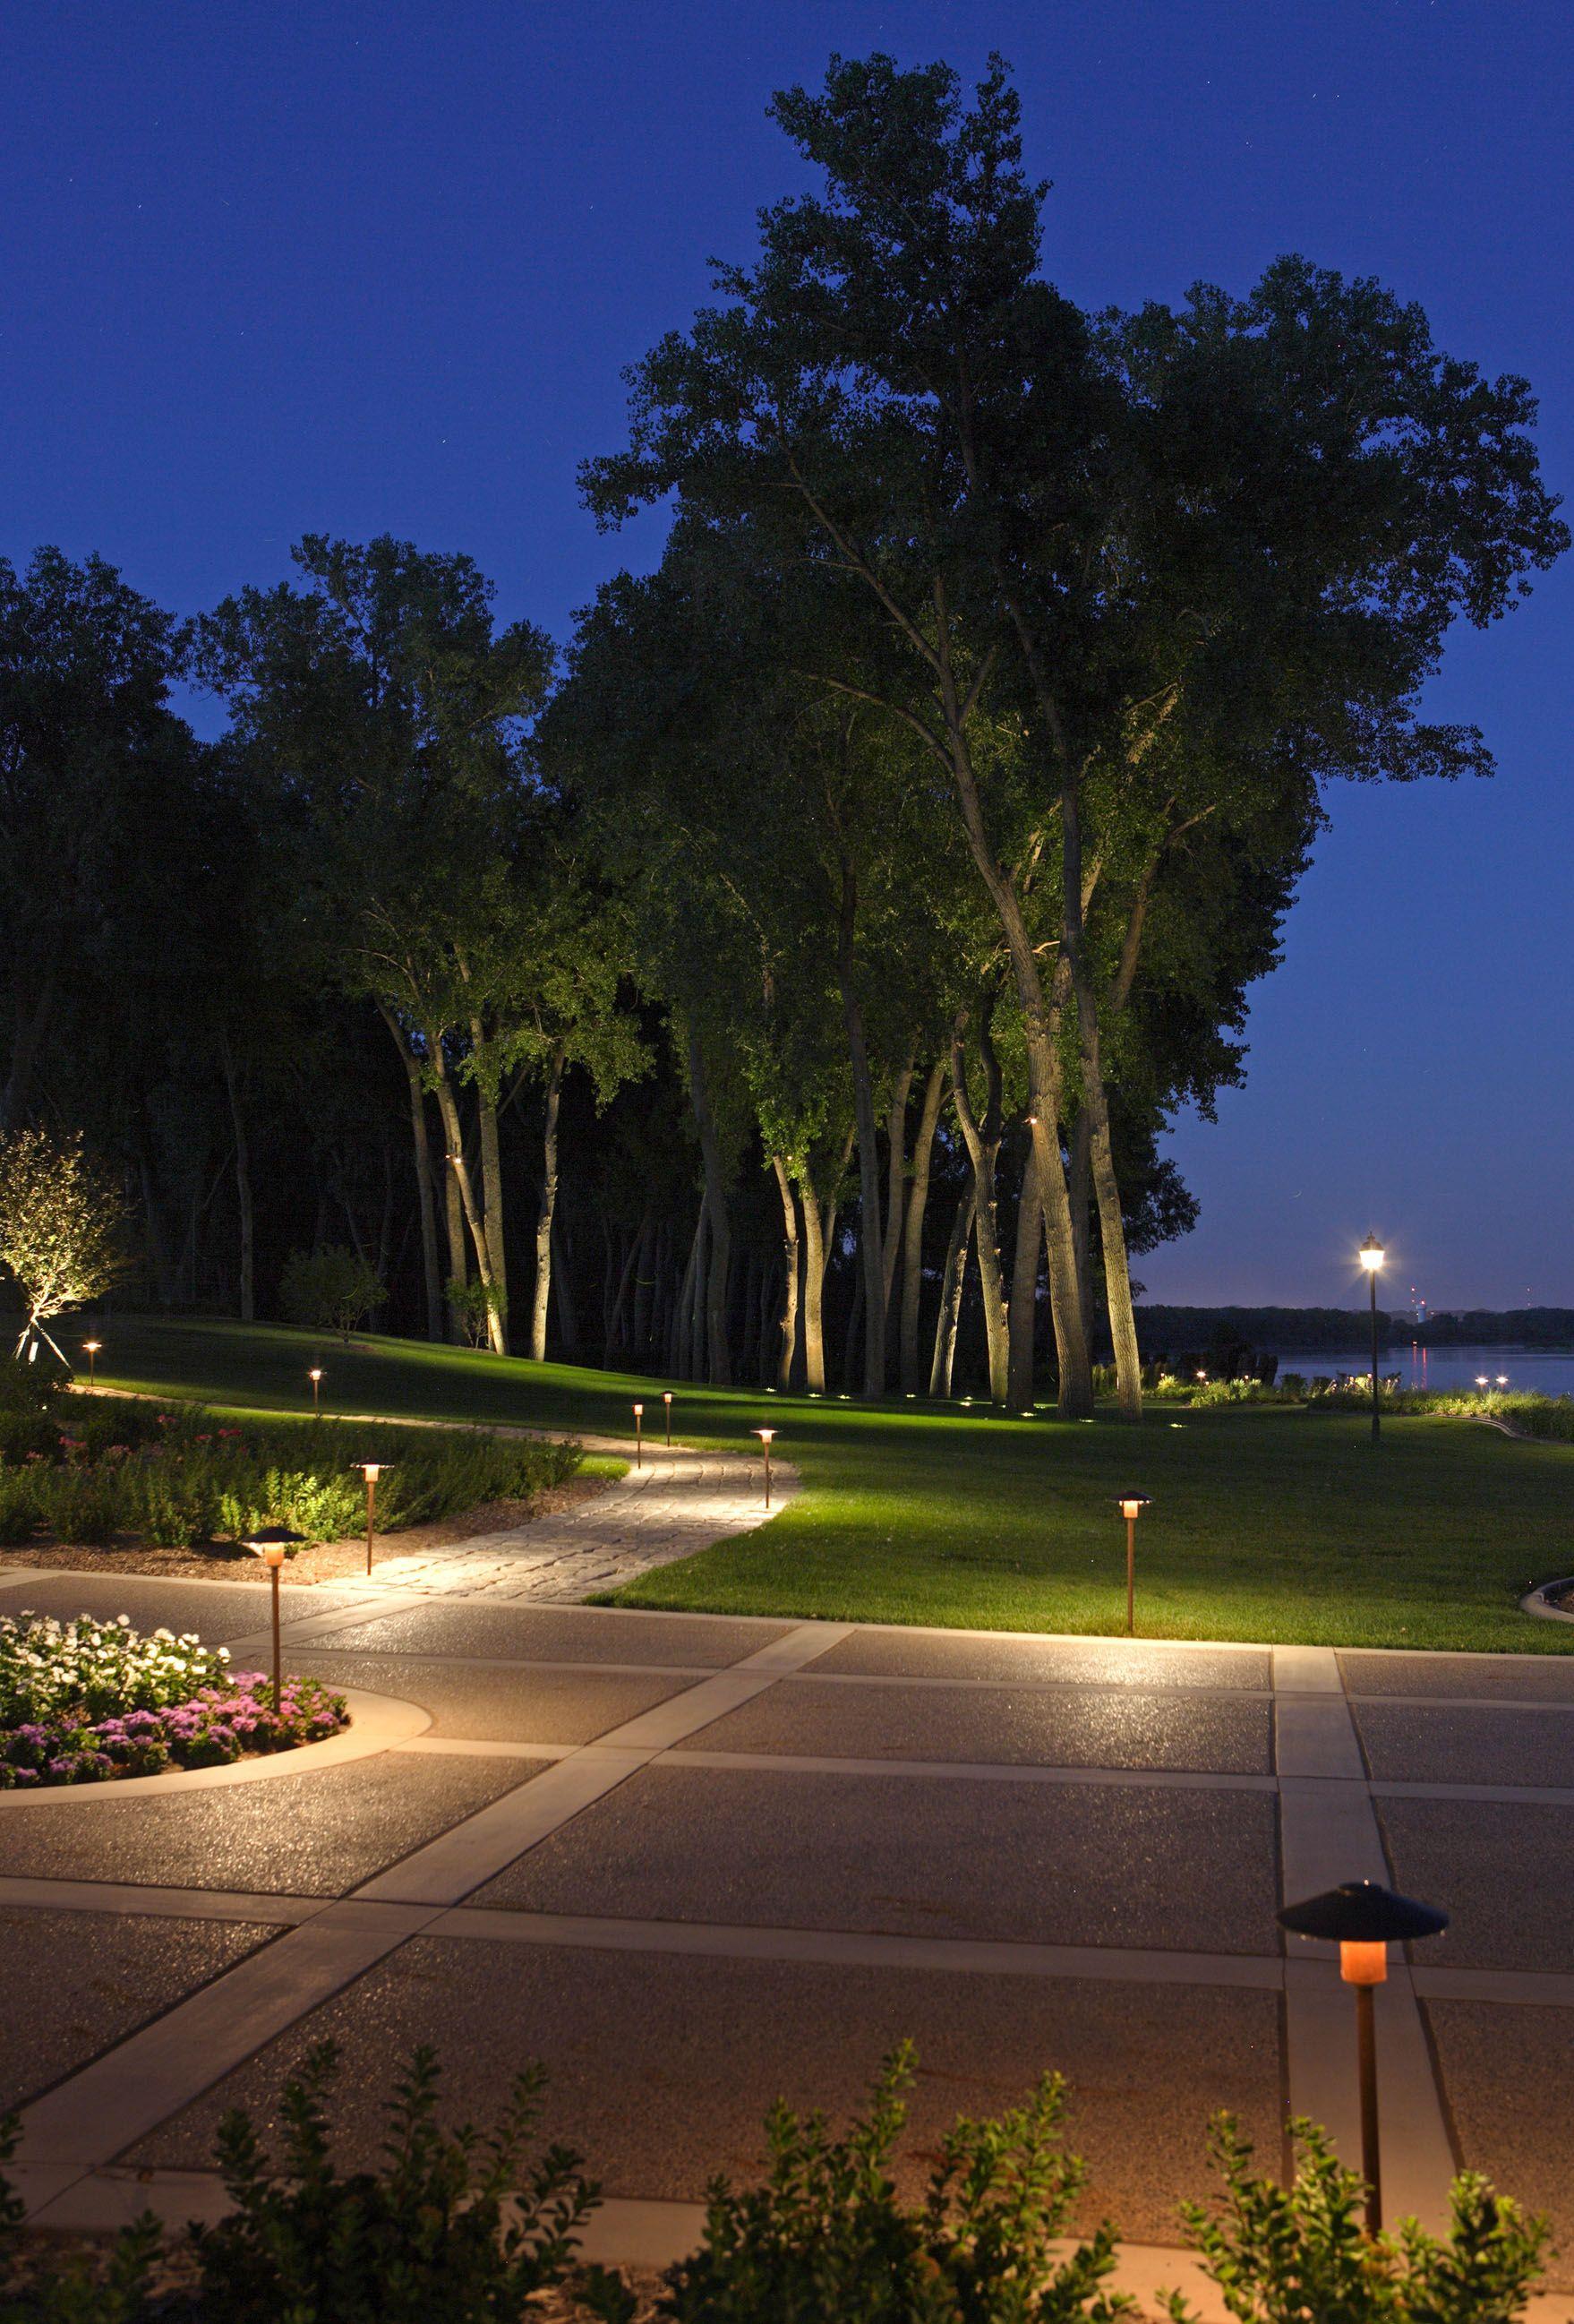 Outdoor security lighting outdoor security lighting pinterest outdoor security lighting driveway aloadofball Images